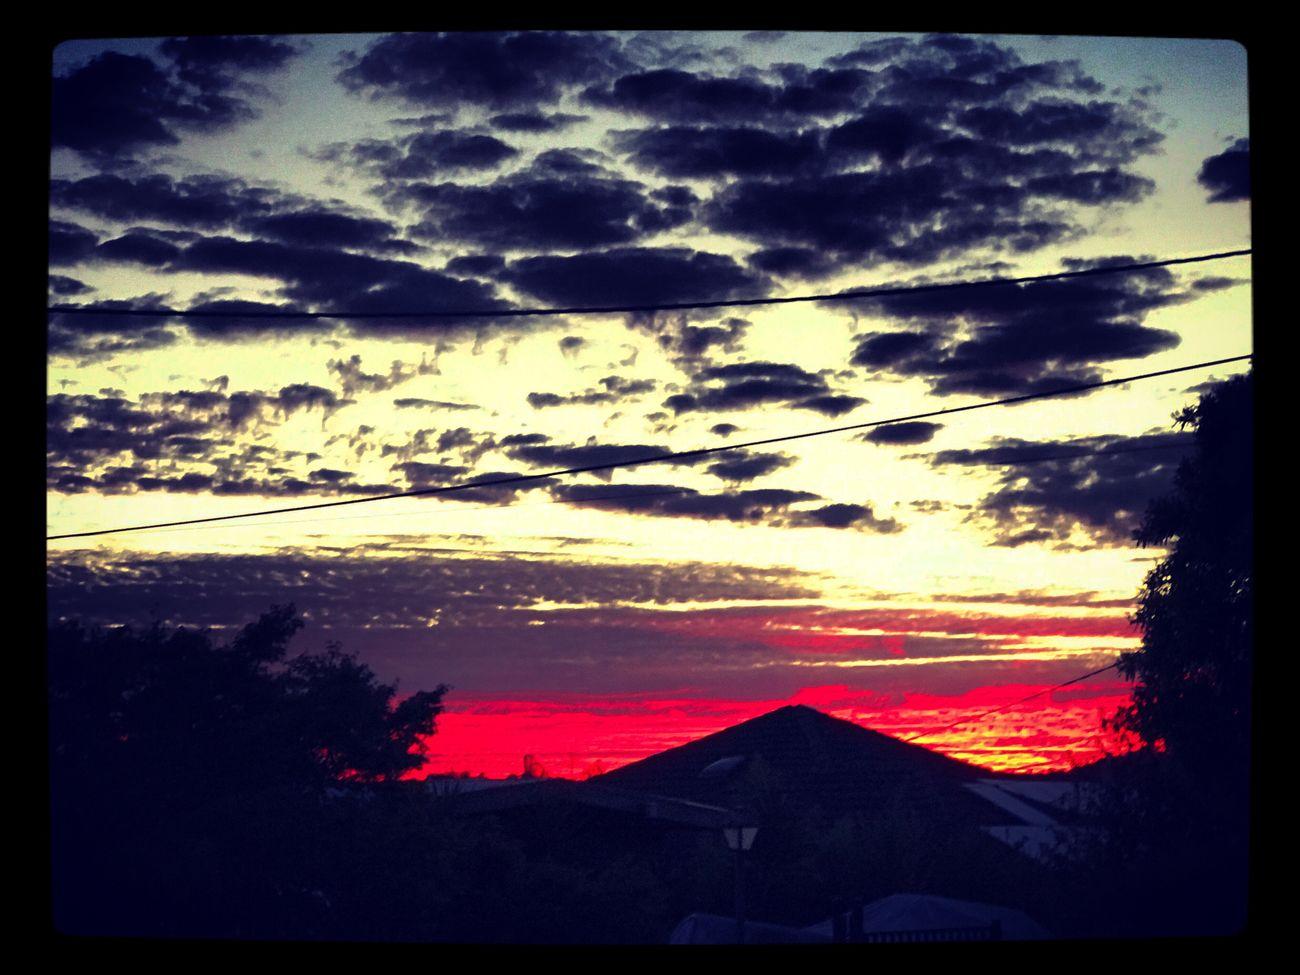 Sometime's this happen's in a blink of an eye 🌤💖🌤 Beautifulskies Orangeskies Naturesfinest Love💏 Skyseries